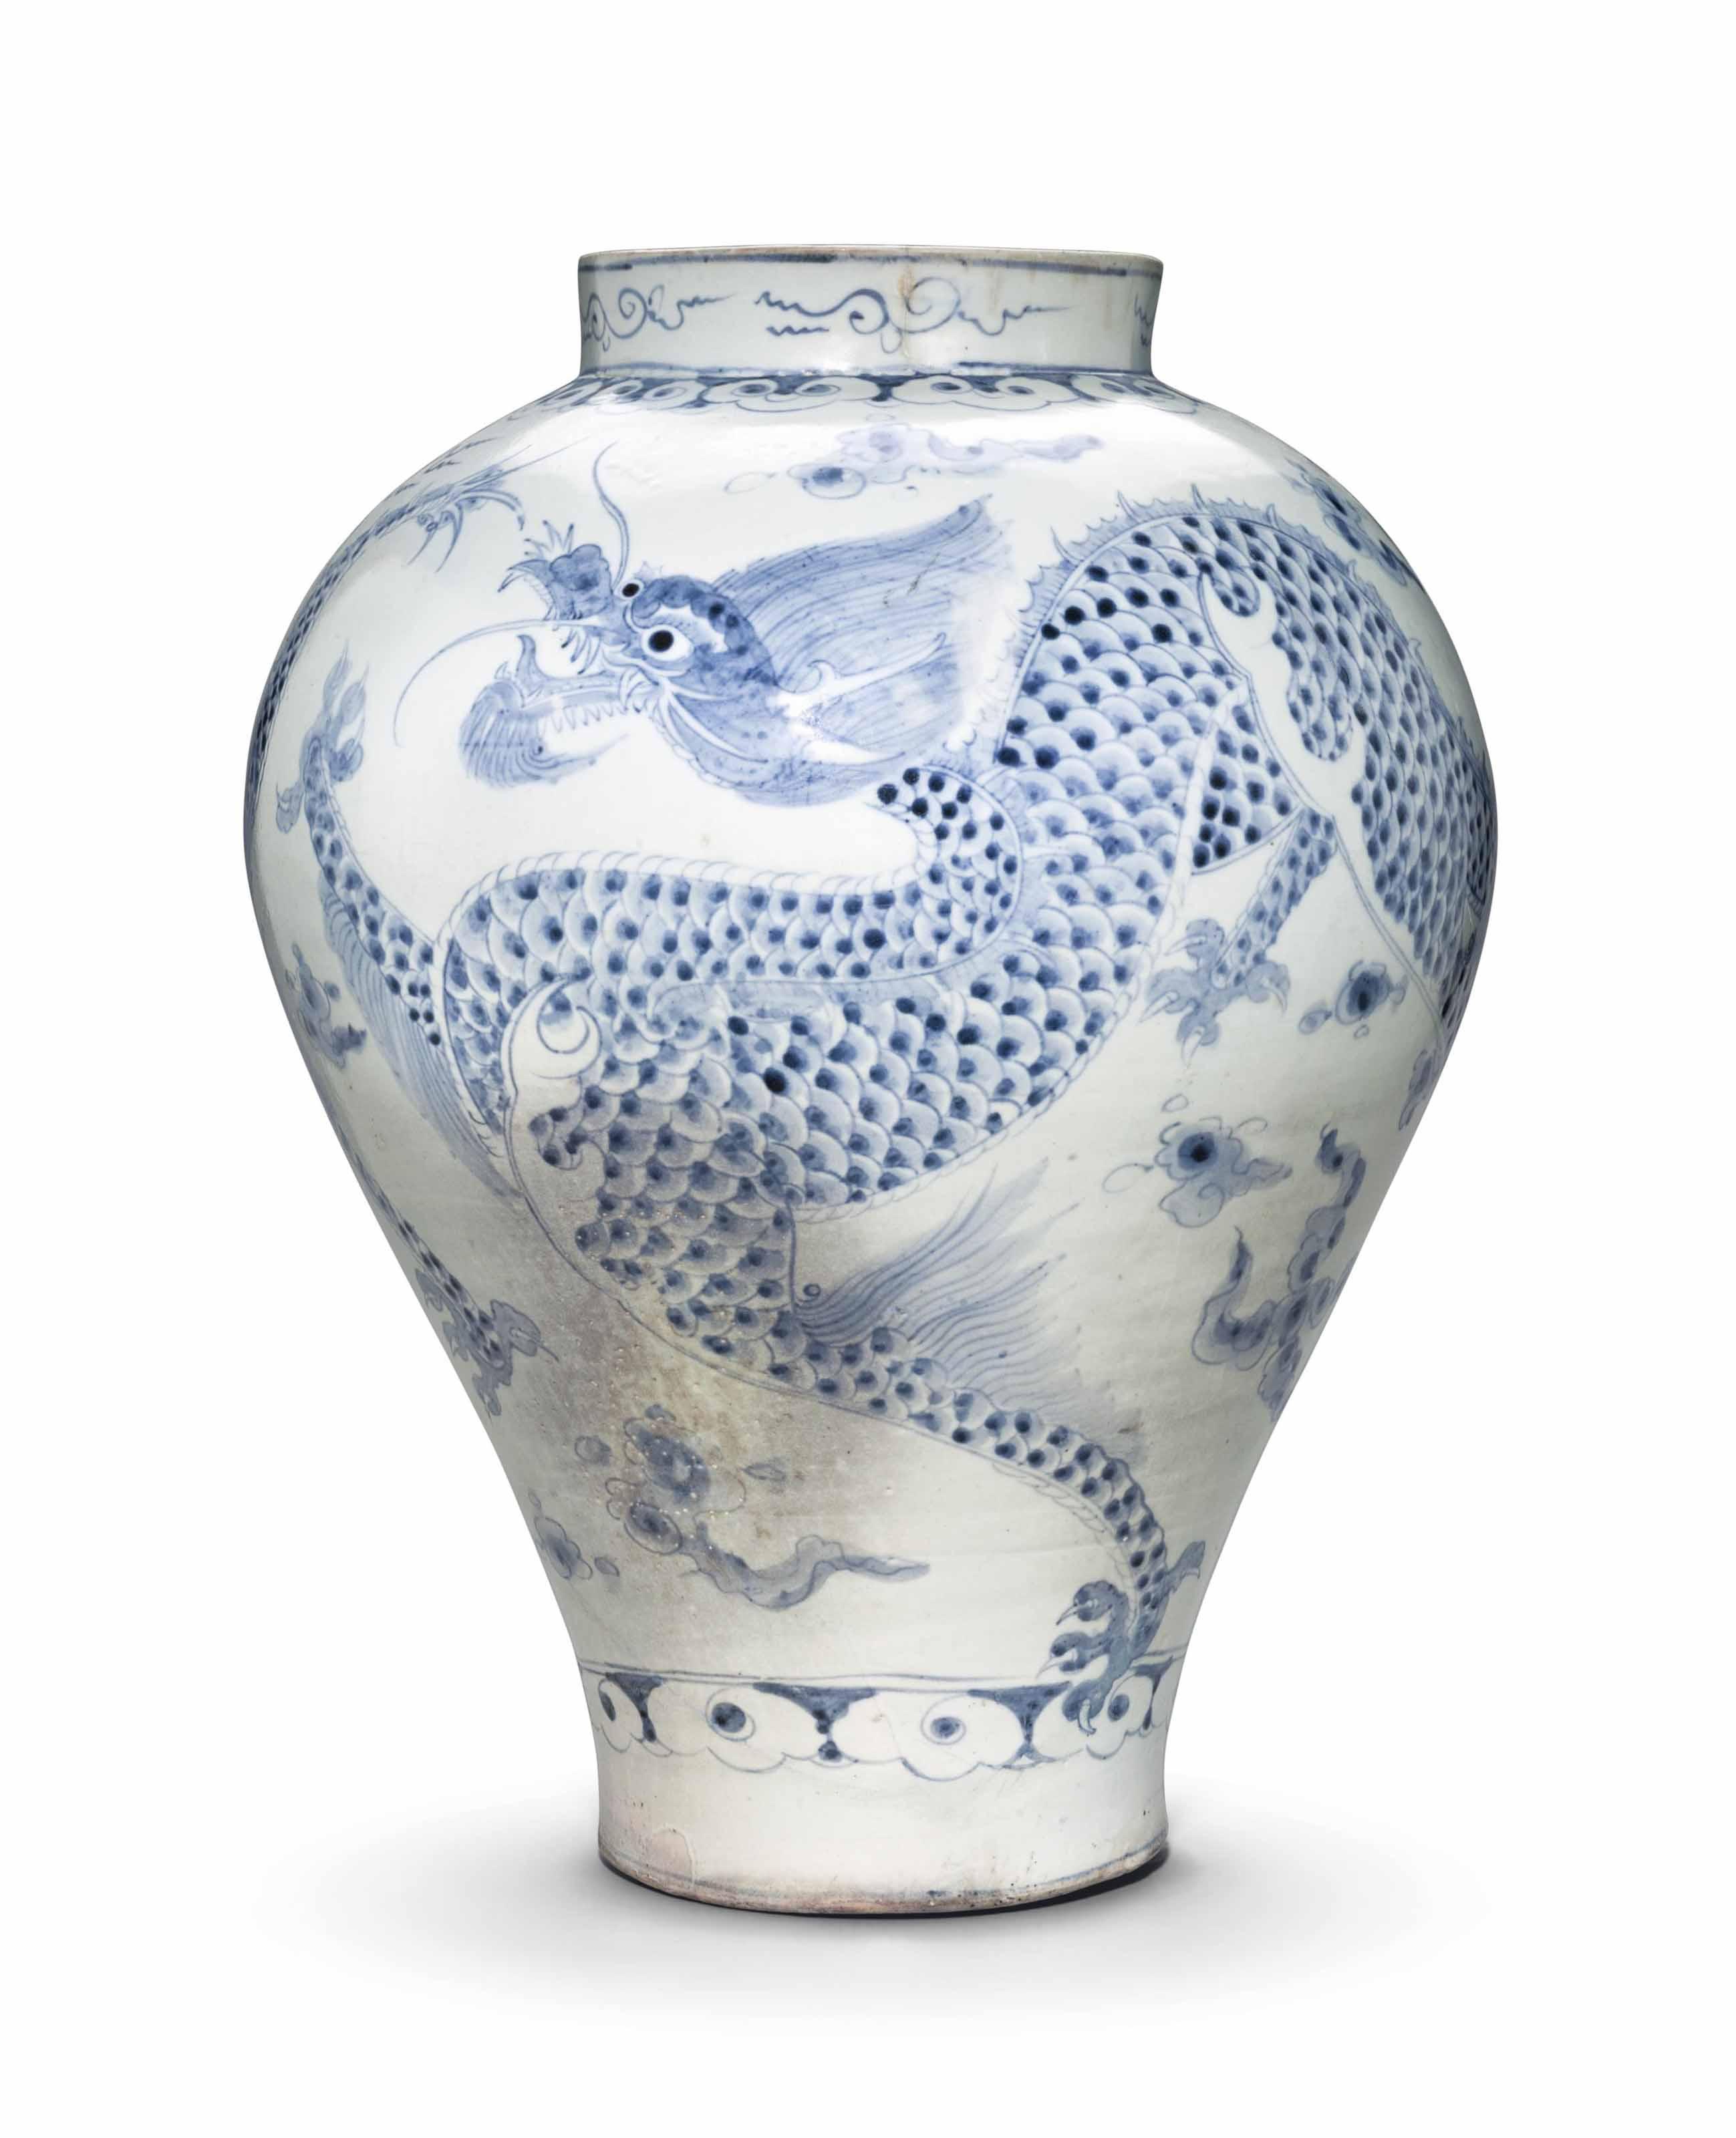 A Blue and White Porcelain Dragon Jar